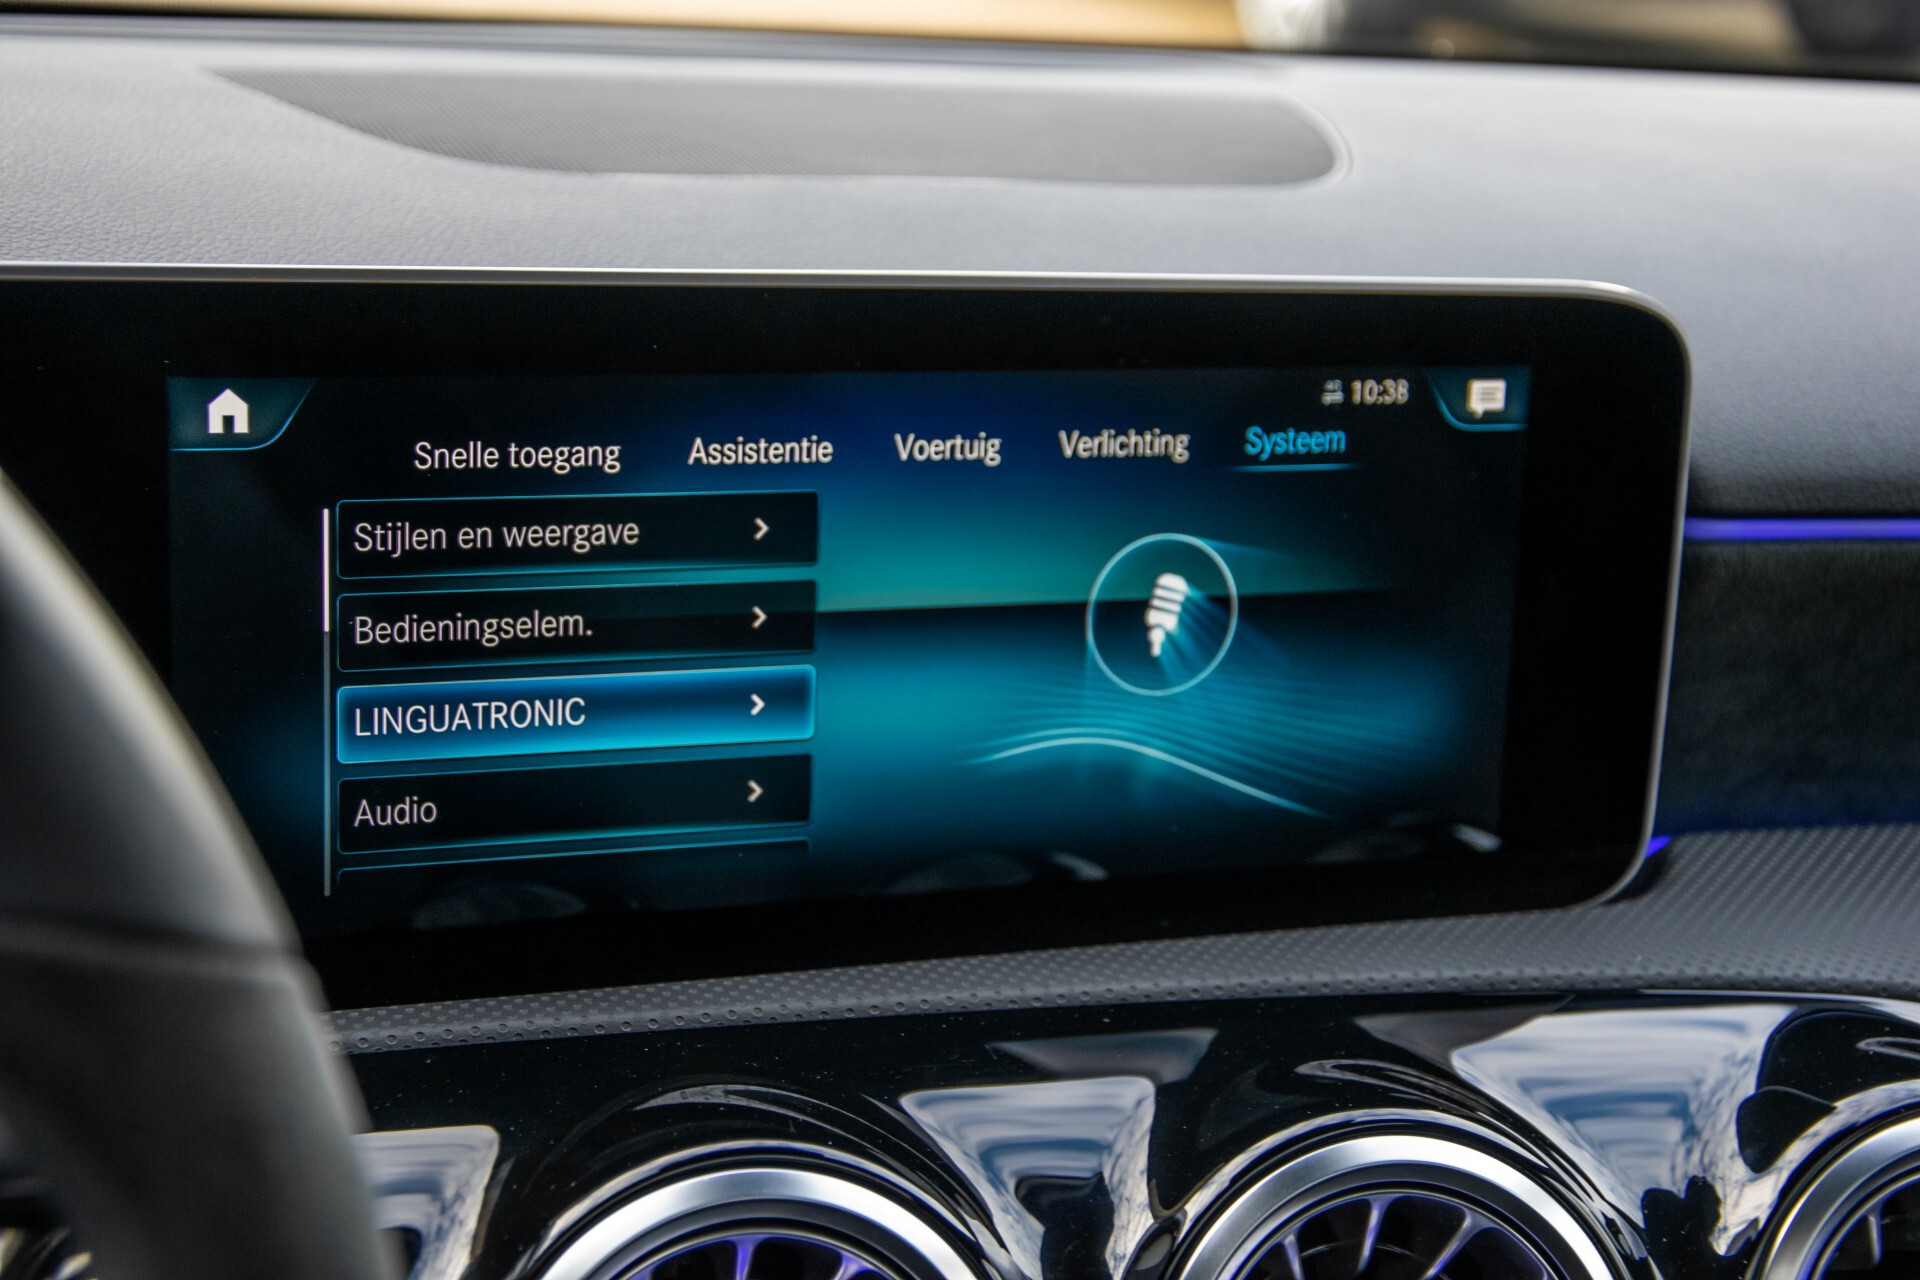 Mercedes-Benz A-Klasse 250 4-M AMG Panorama/Keyless-Entry/MBUX/HUD/Burmester/360/Multibeam LED Aut7 Foto 38